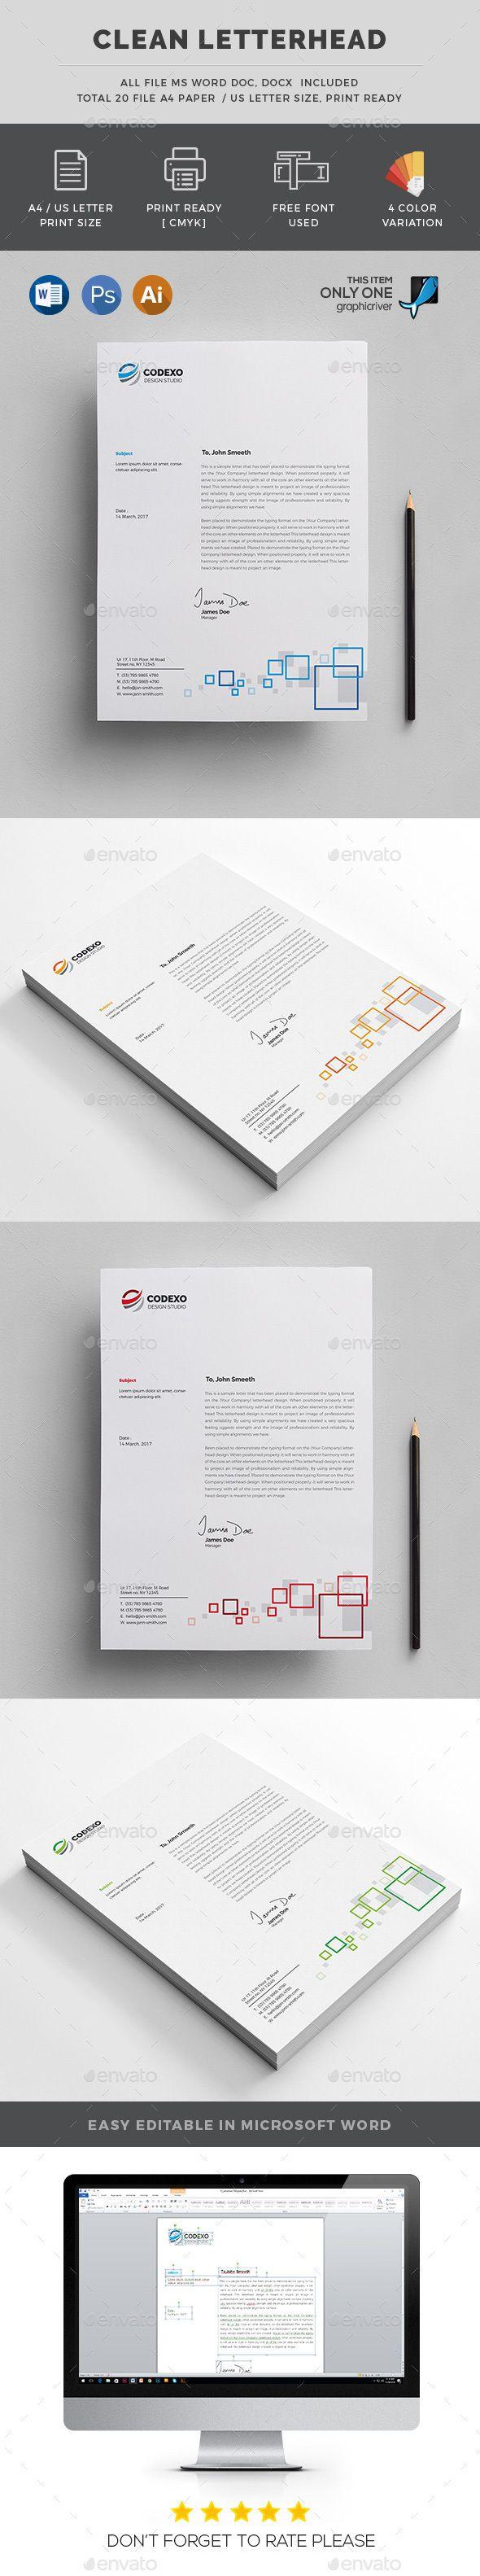 Letterhead | Fonts-logos-icons | Letterhead, Letterhead